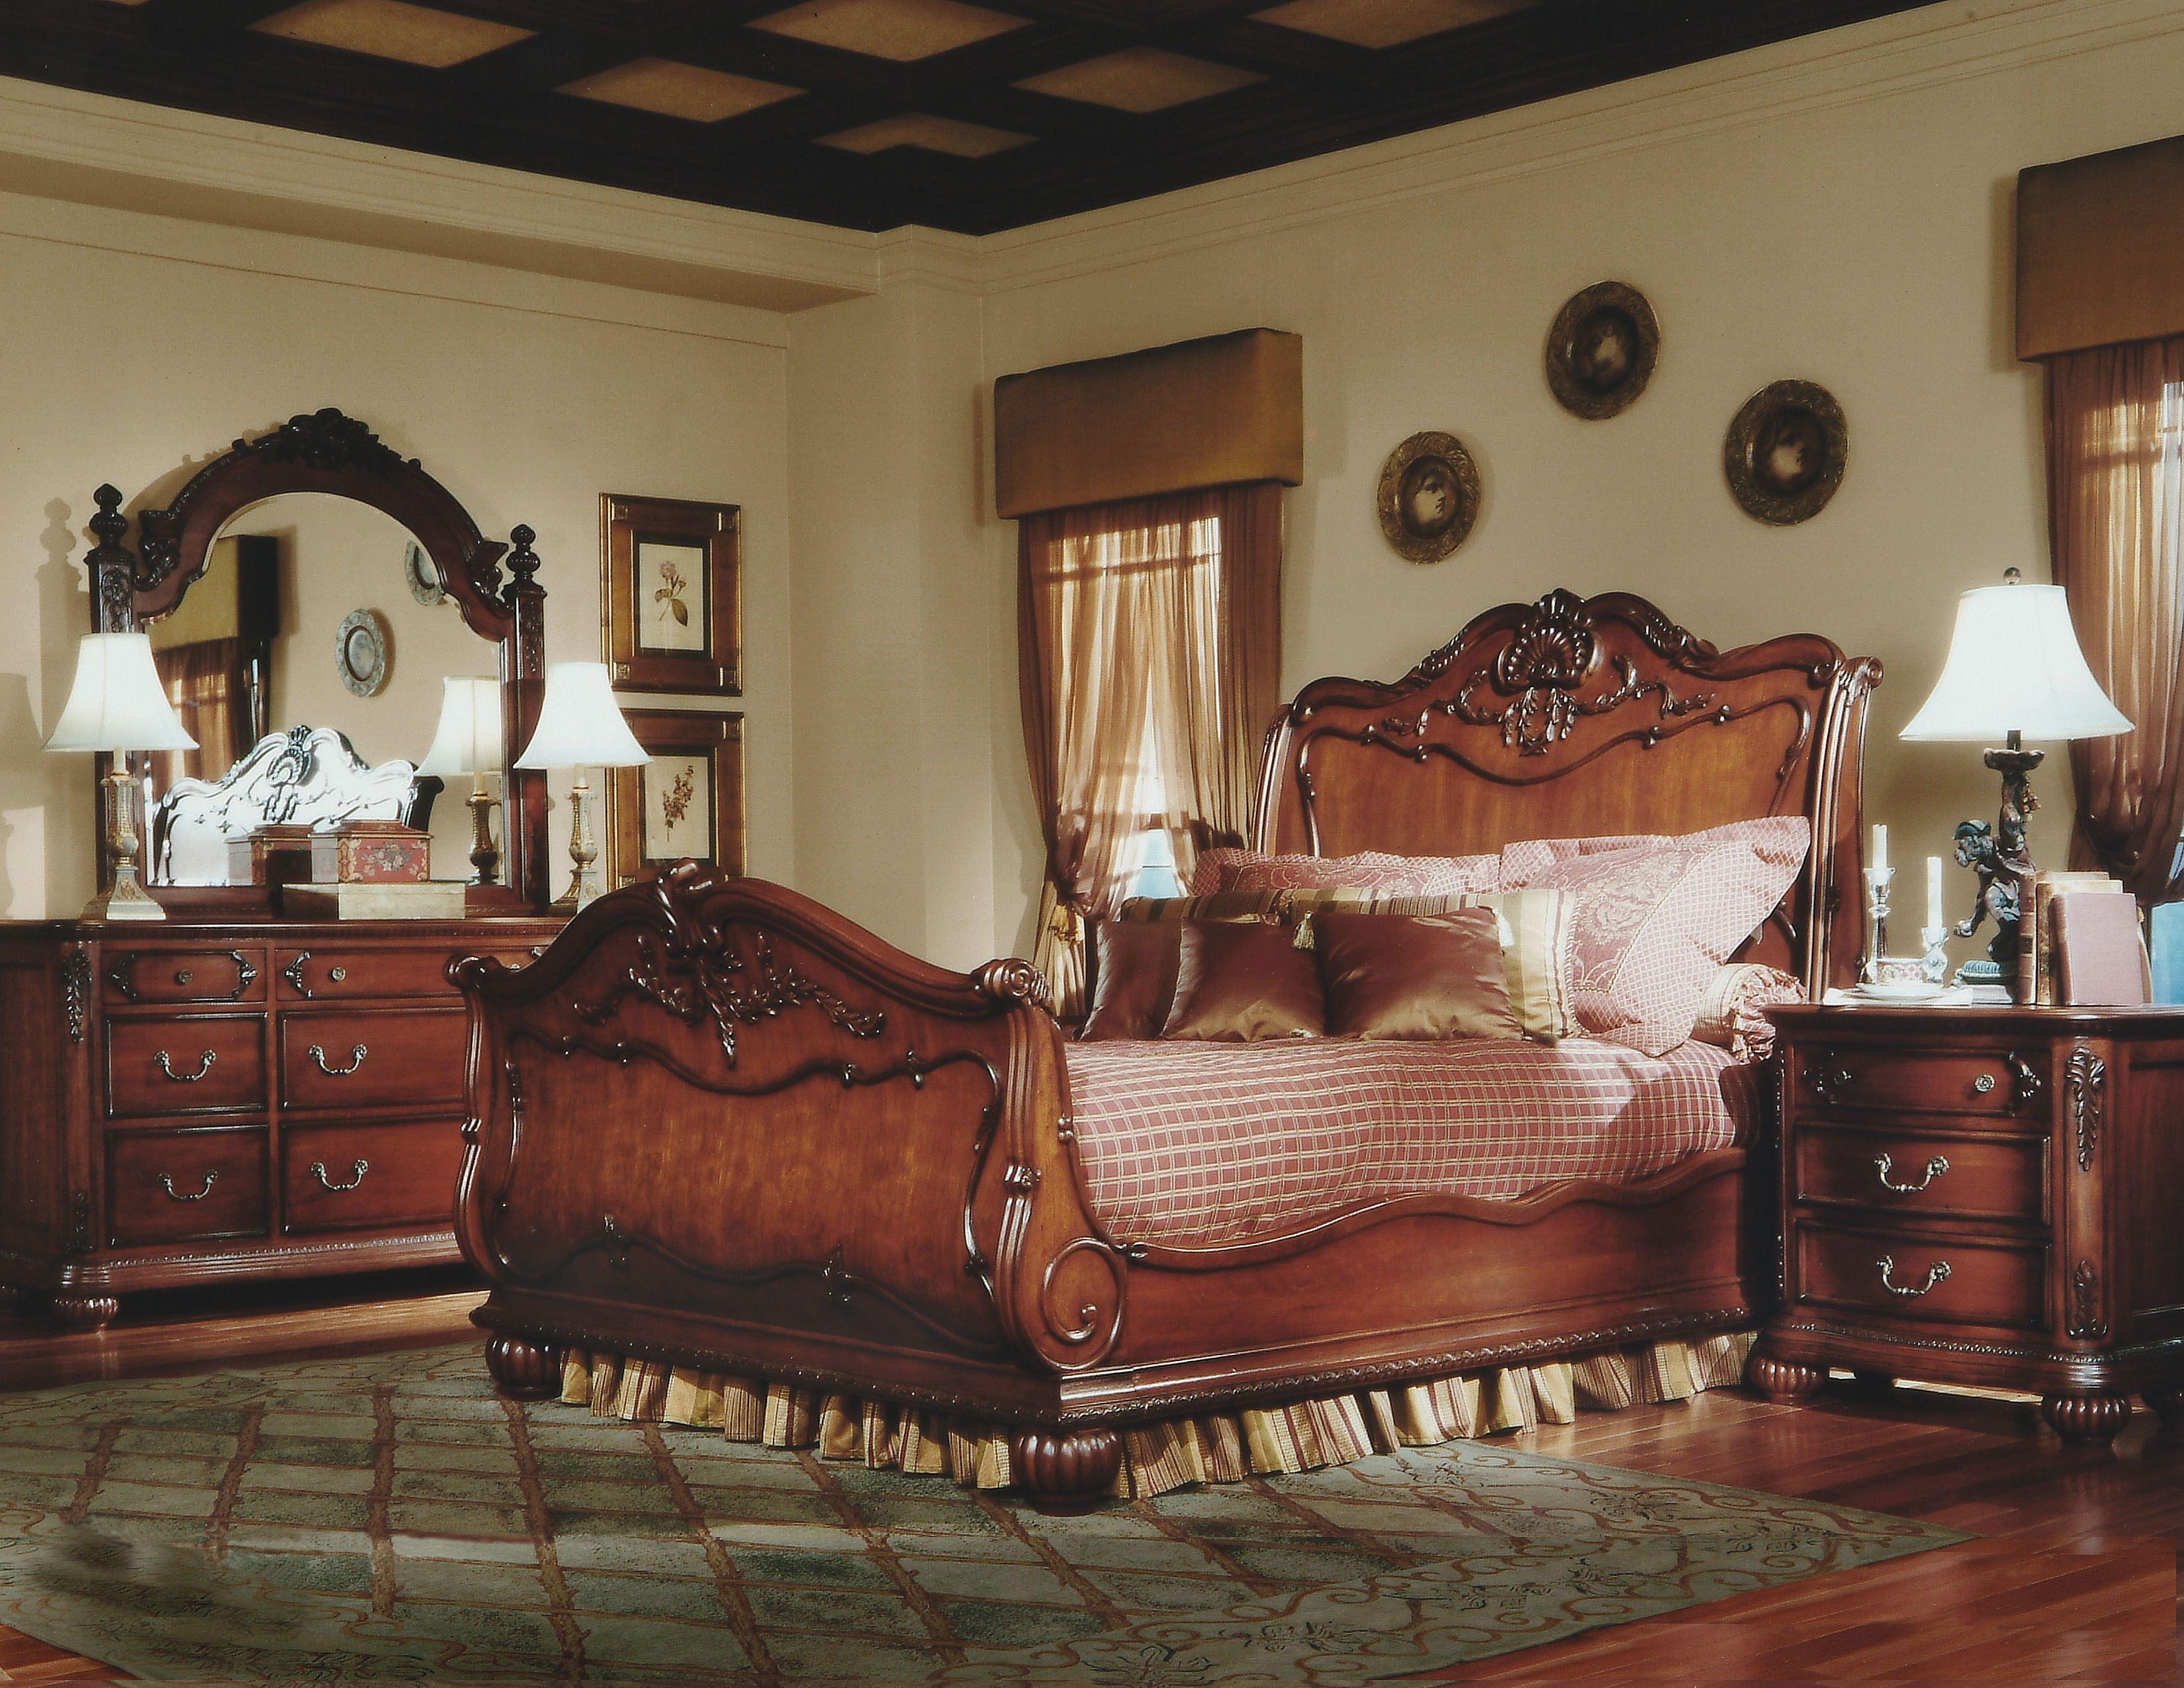 Luxury Bedroom Furniture Sets King Classic Bedroom Furniture